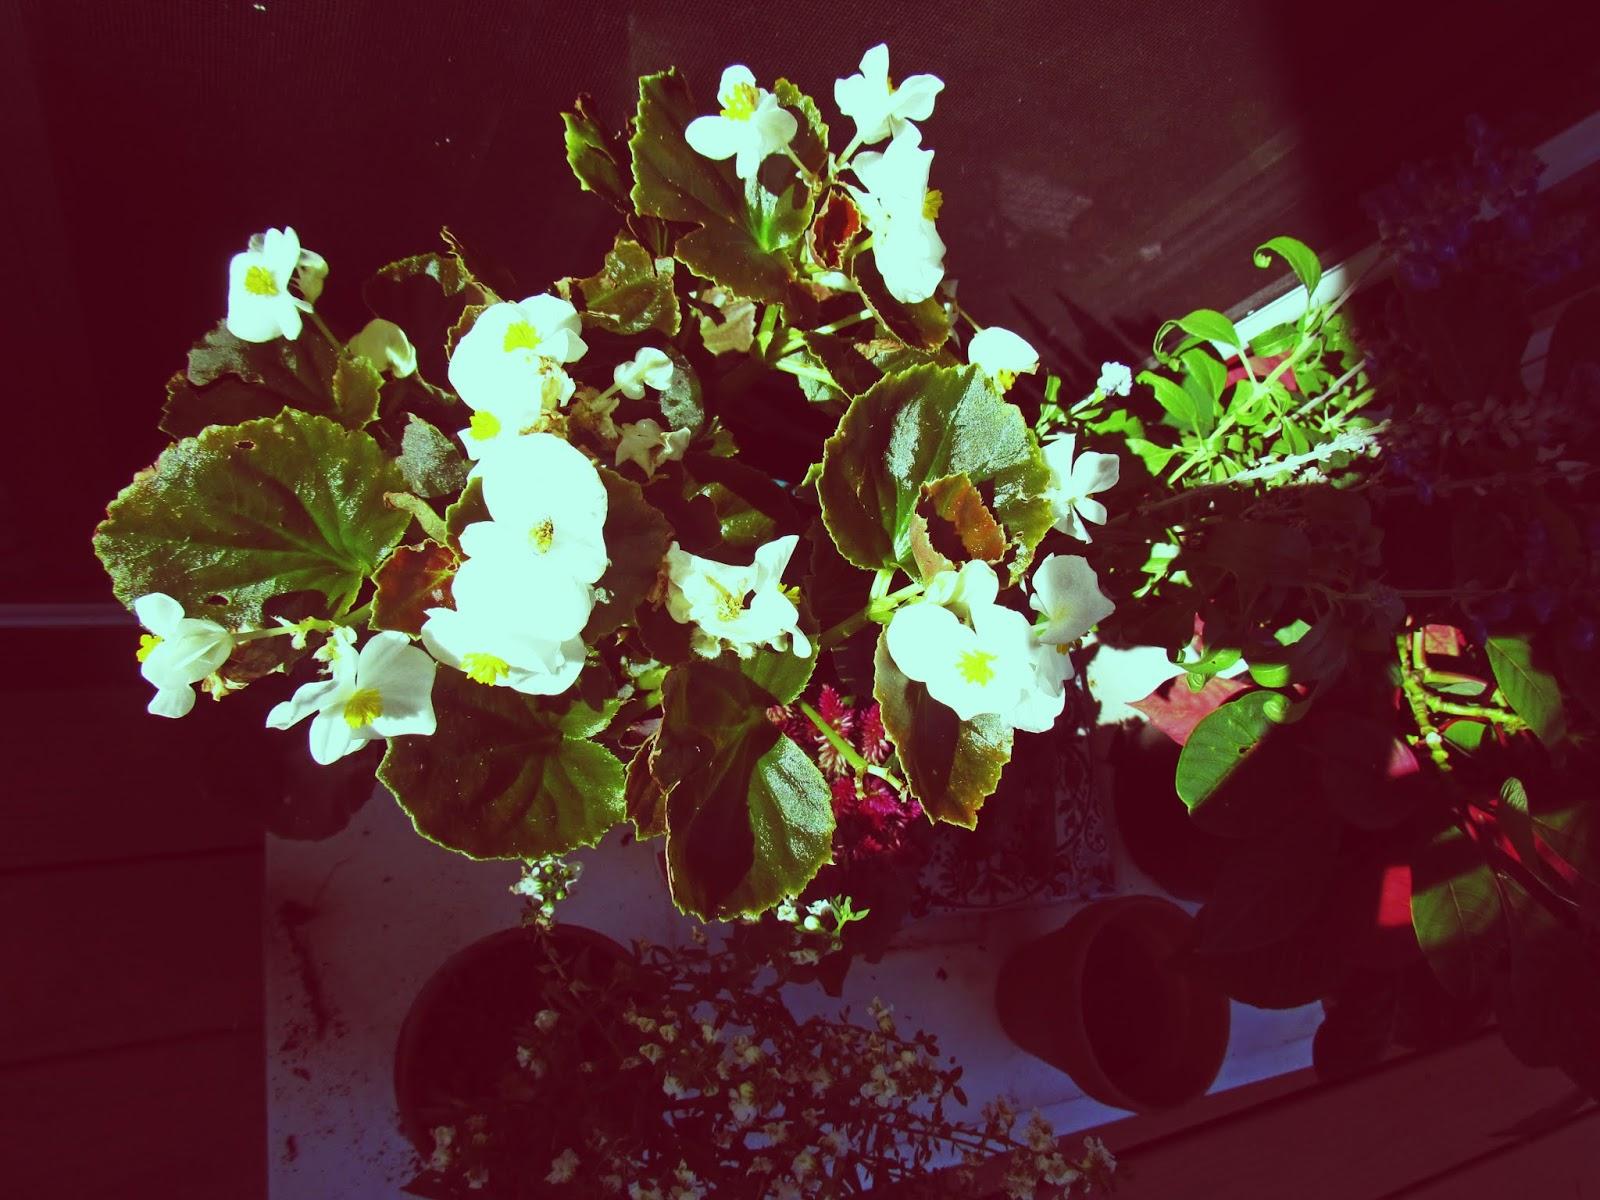 Flowering Begonia Houseplant in the Garden